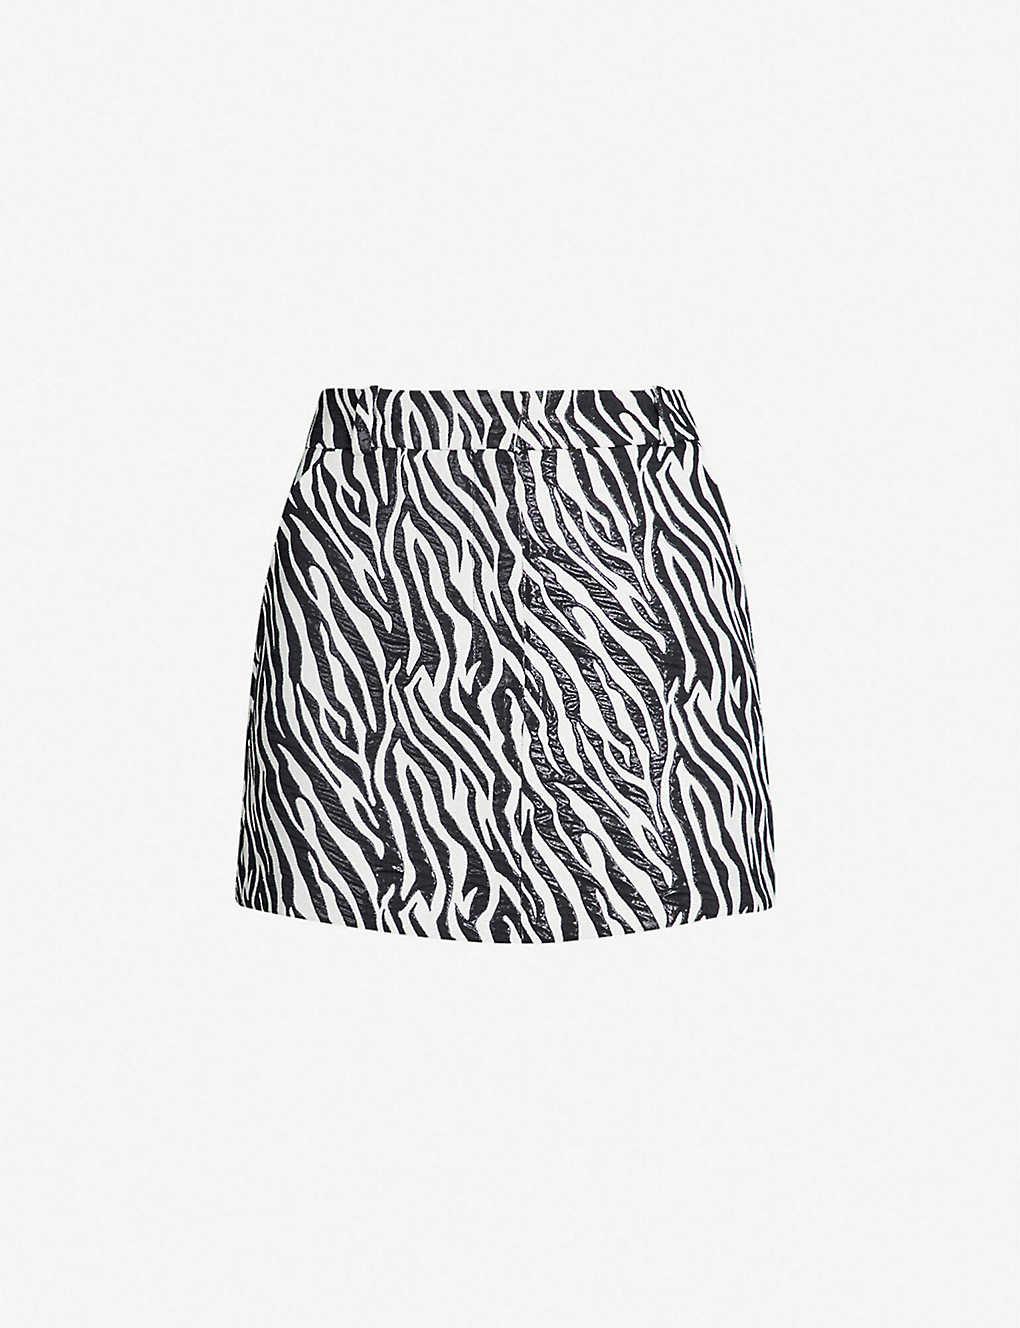 best selection of 2019 latest trends special discount TOPSHOP - Zebra-print woven mini skirt | Selfridges.com